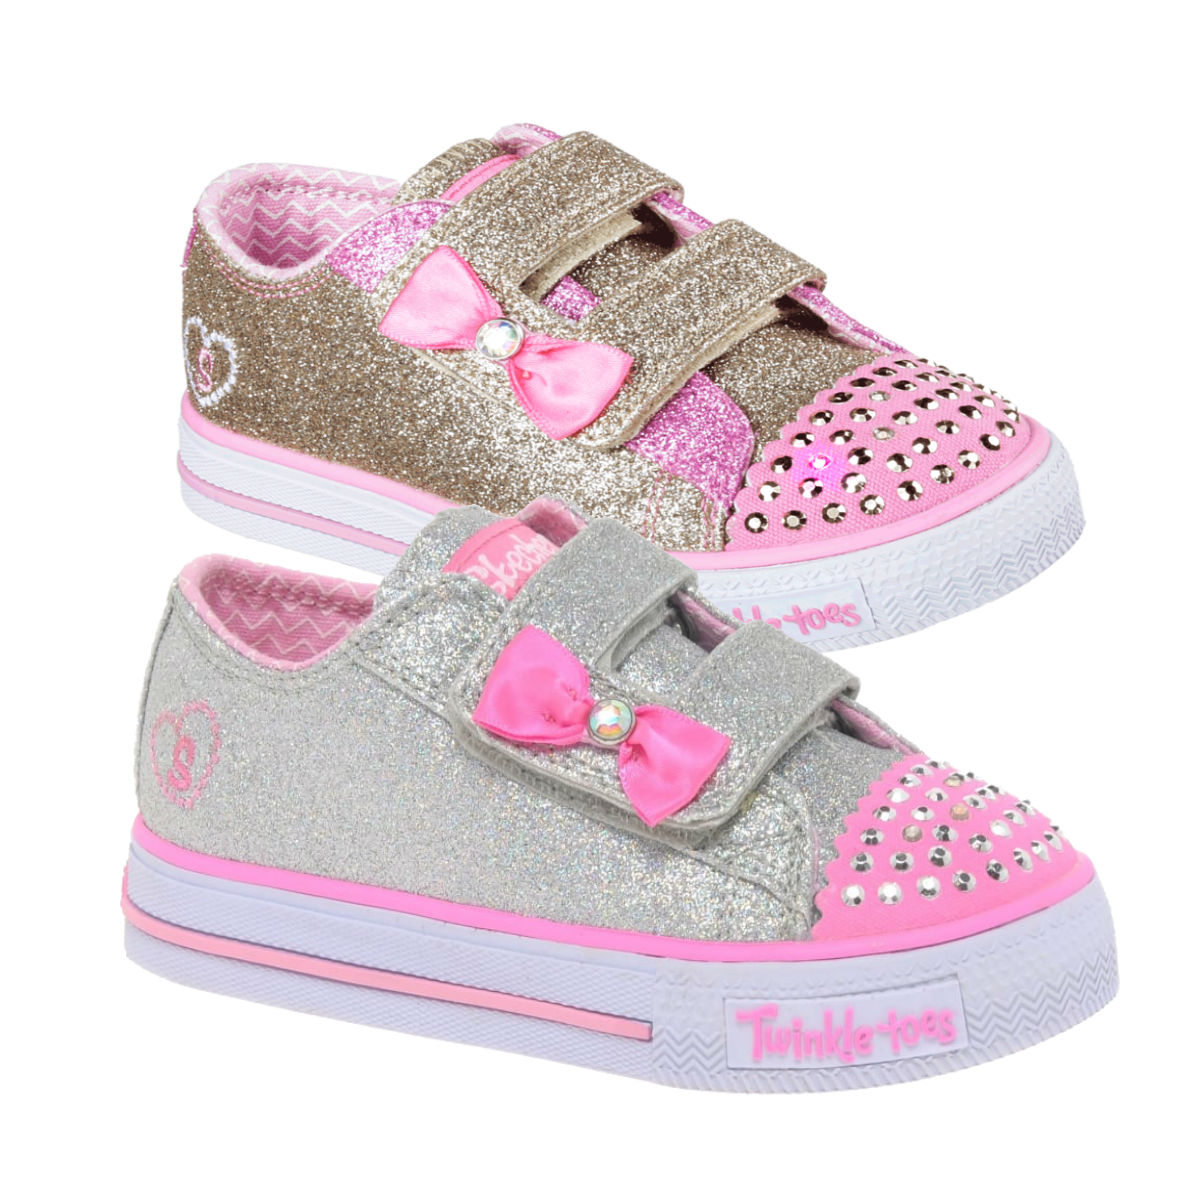 Skechers Kids Girls LED Light Up Trainers Low Top Shoes U0026#39;Twinkle Toes Shufflesu0026#39; | EBay